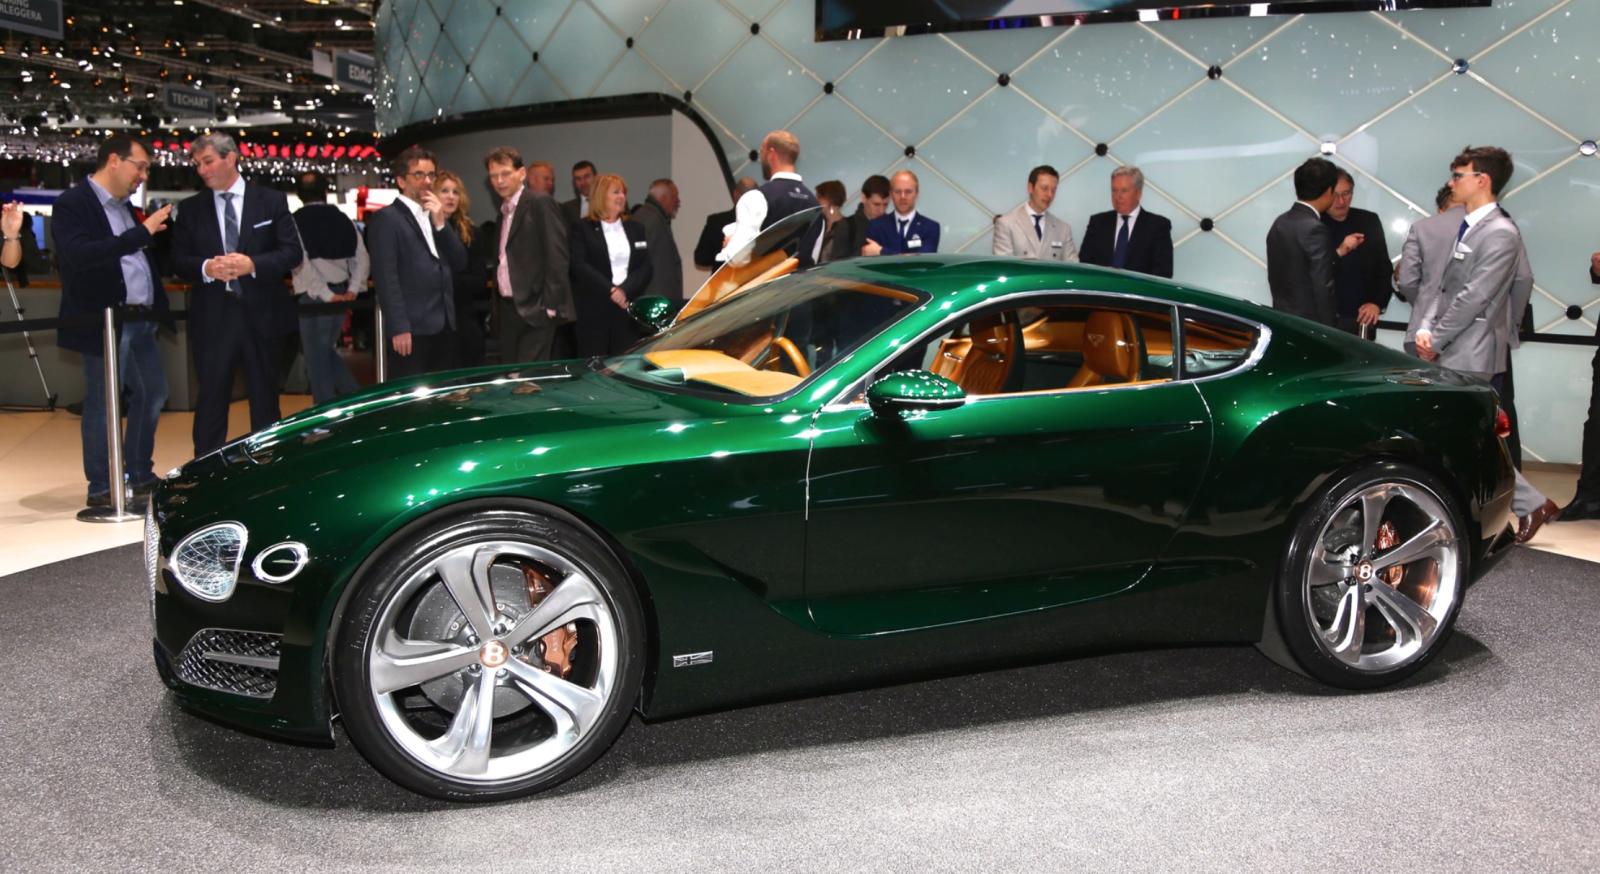 Conceptualizing Concepts At The 2015 Geneva Auto Show